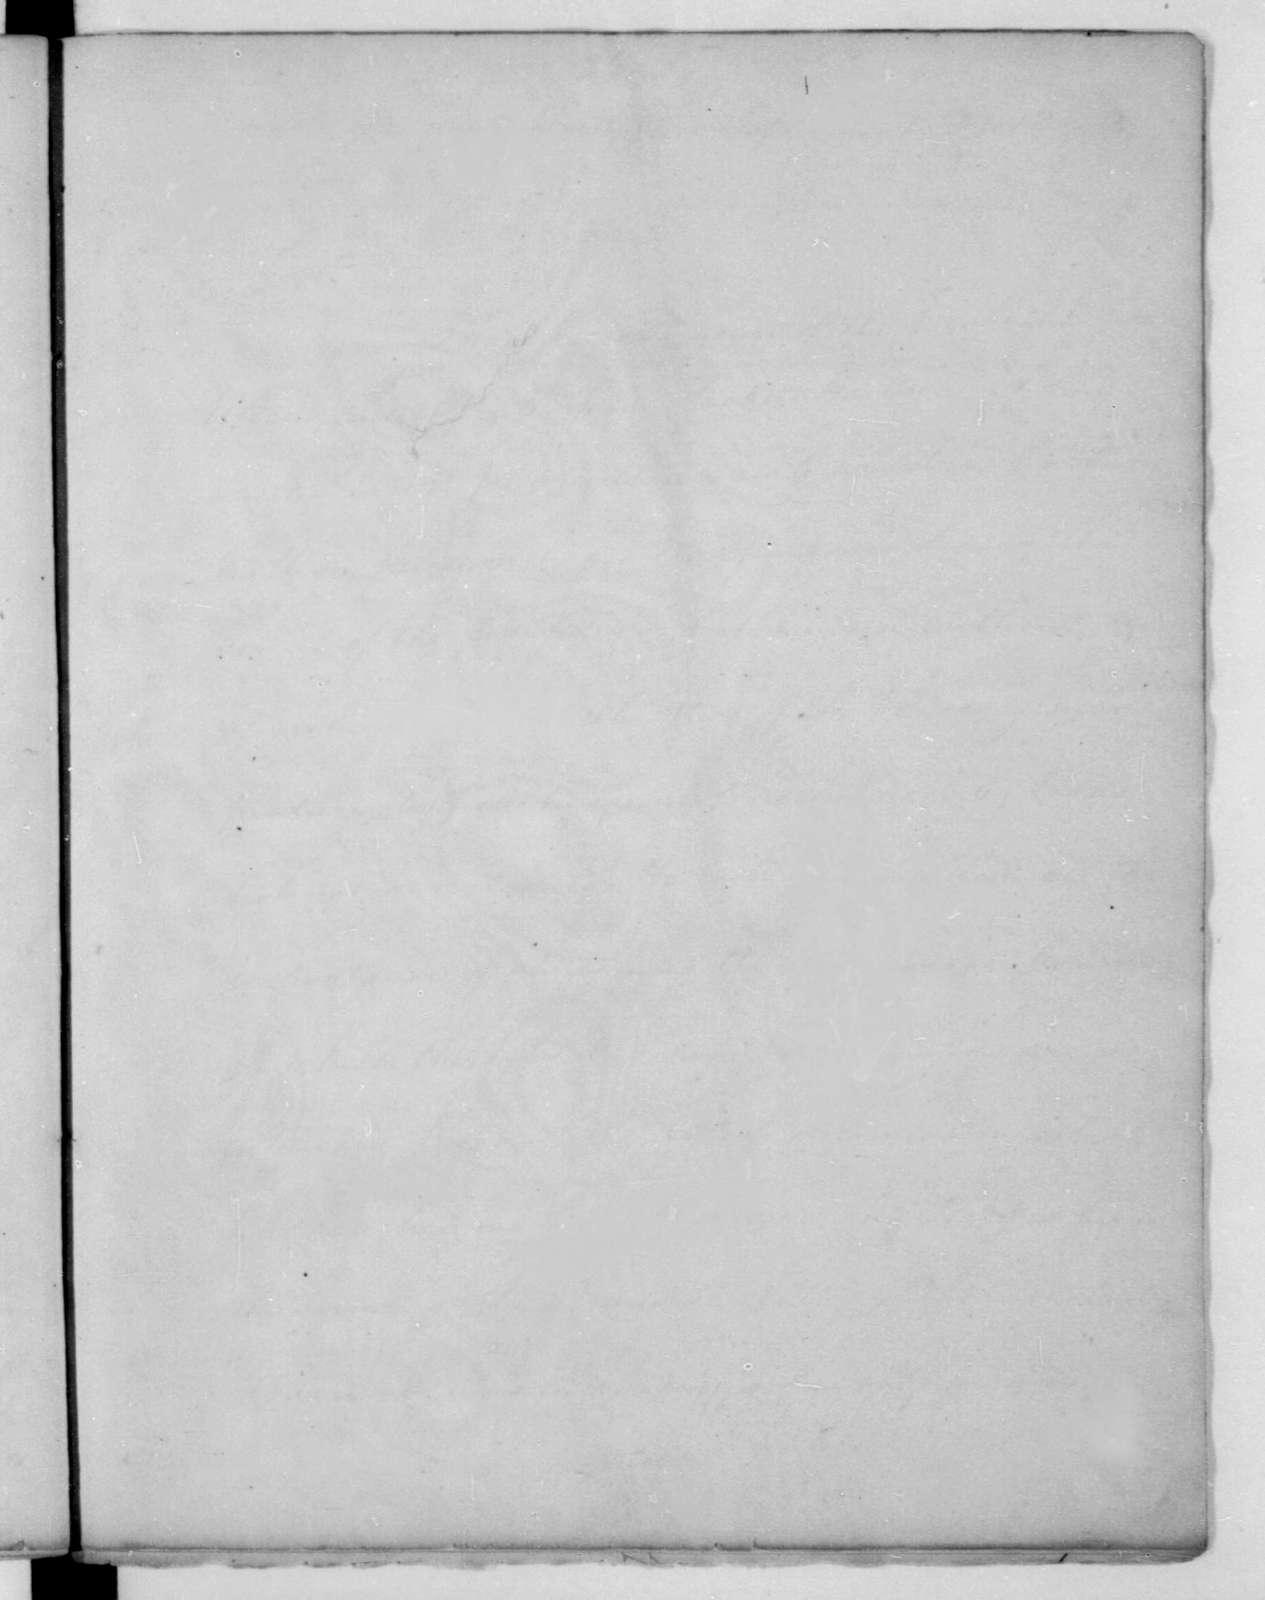 James Madison to William Jones, September 16, 1813.